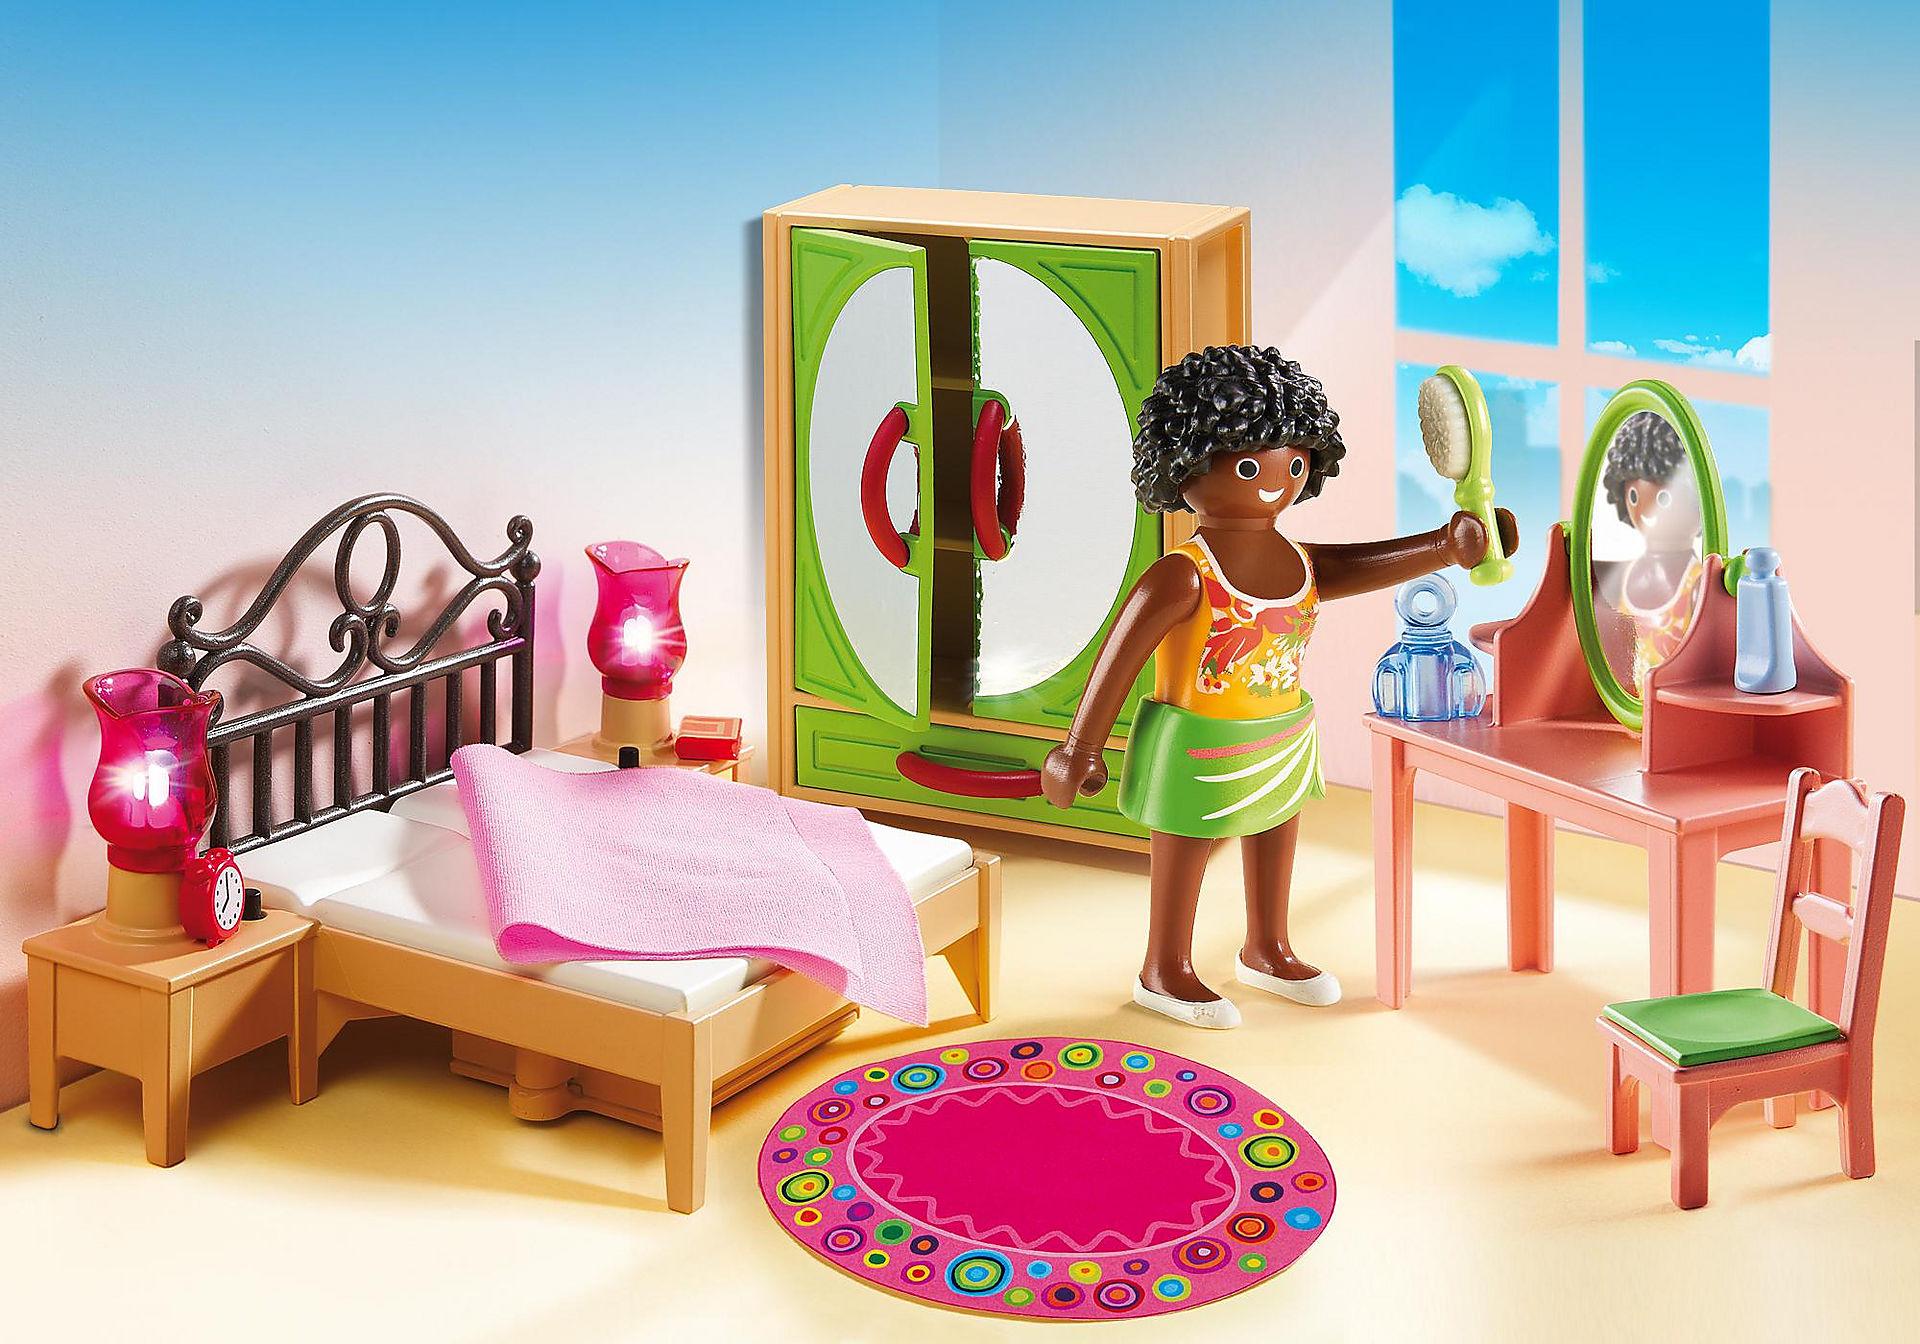 http://media.playmobil.com/i/playmobil/5309_product_detail/Schlafzimmer mit Schminktischchen